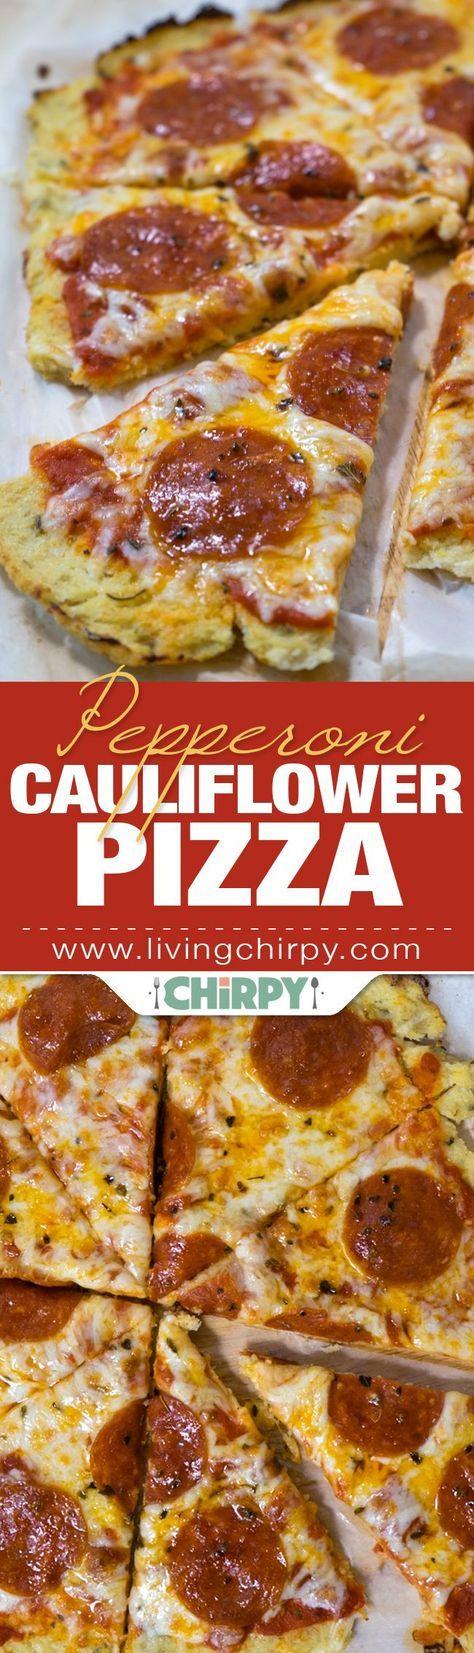 Pepperoni Cauliflower Pizza Recipe Cauliflower Pizza